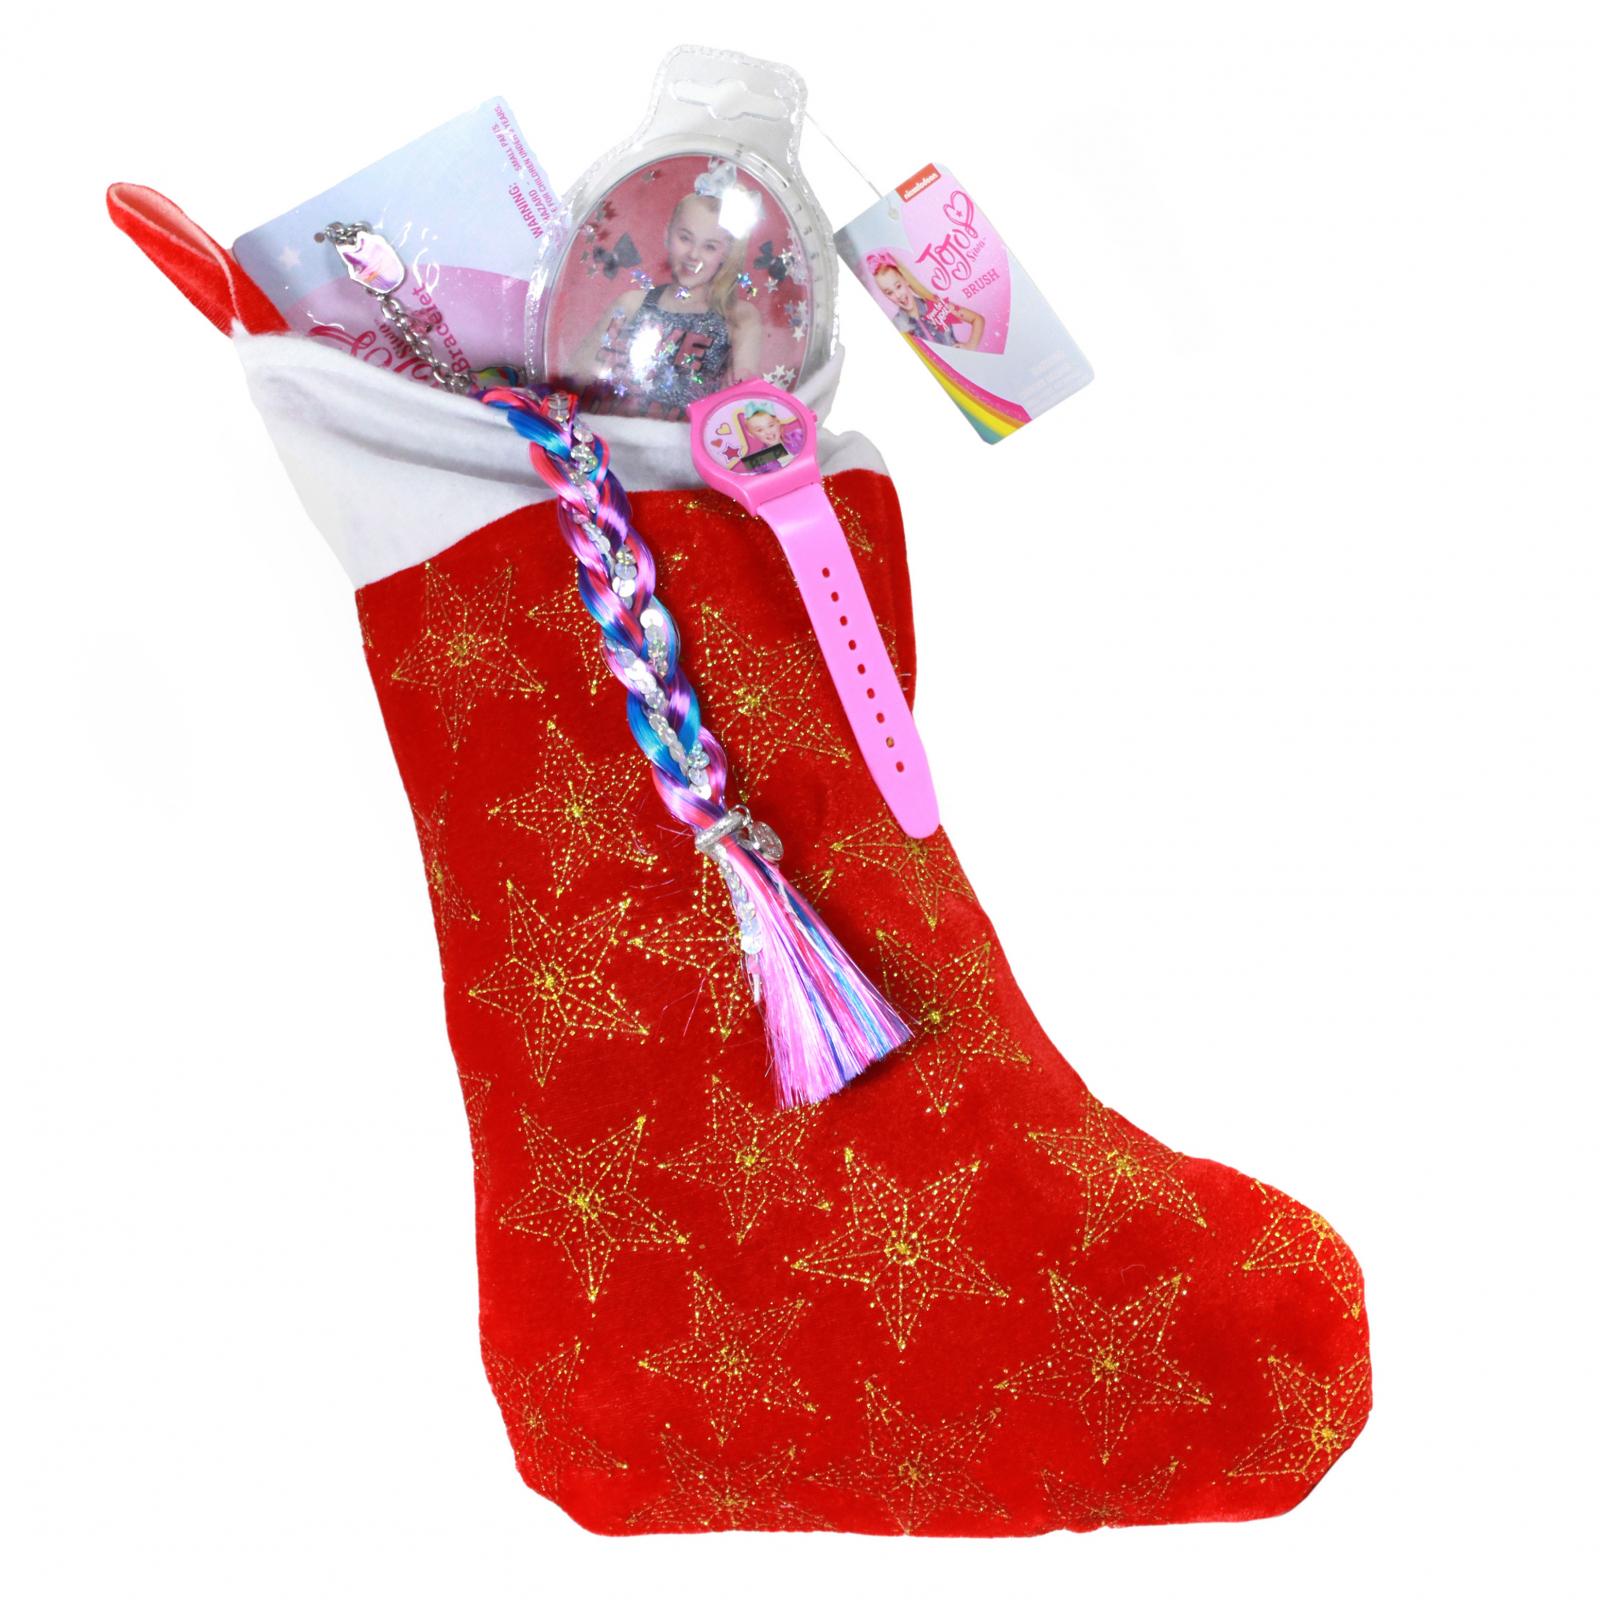 JoJo Siwa Kids Christmas Stocking Filled with Toys 6 Pieces